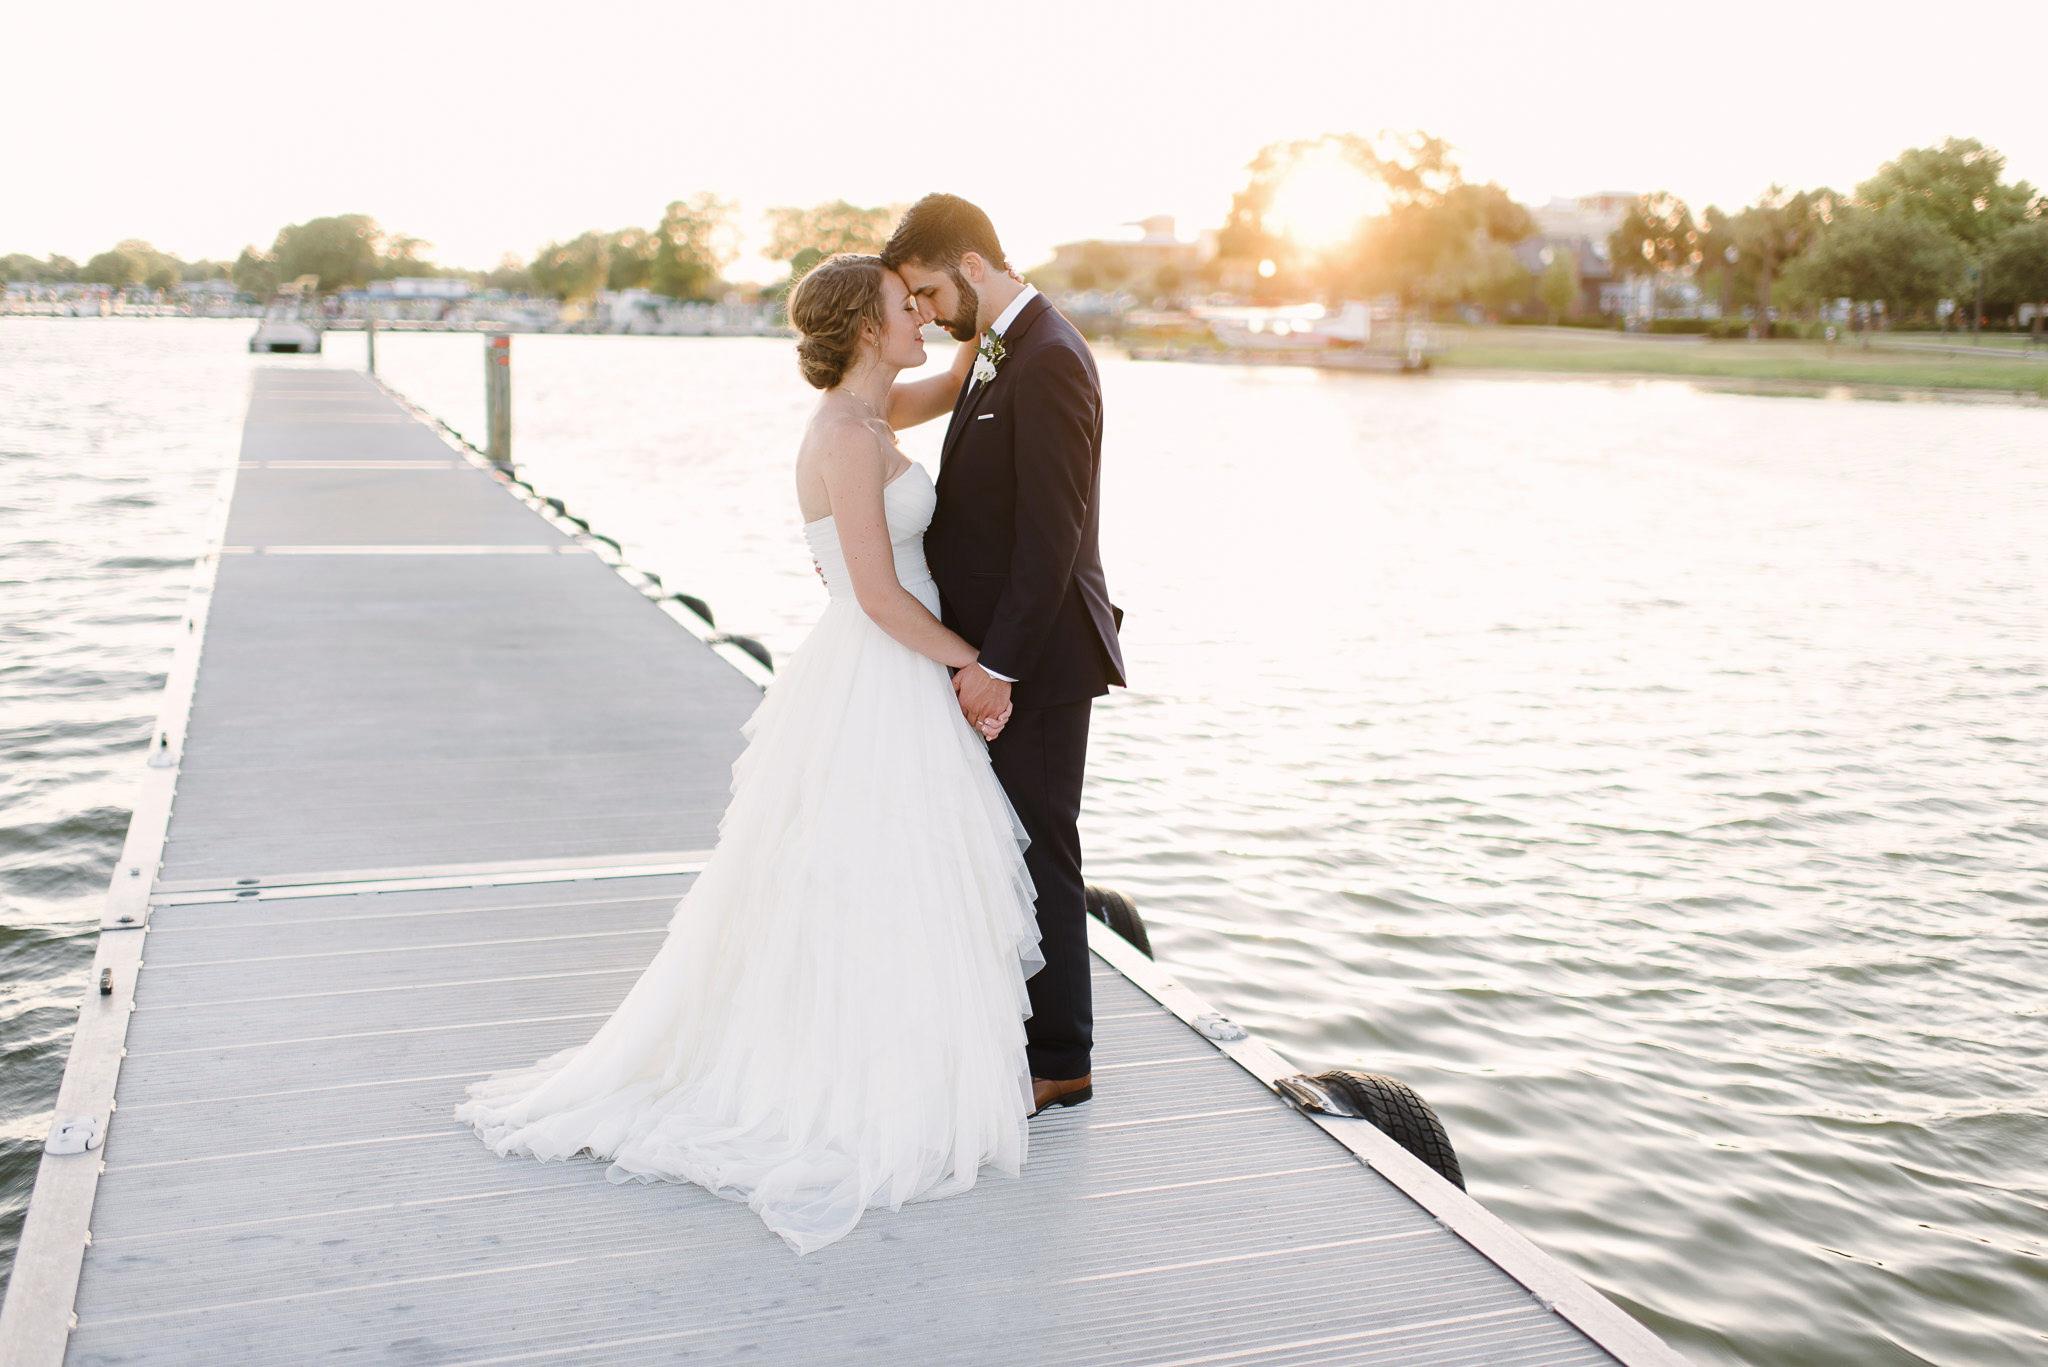 Tavares+Pavilion+on+the+Lake+Wedding+Florida_035.jpg